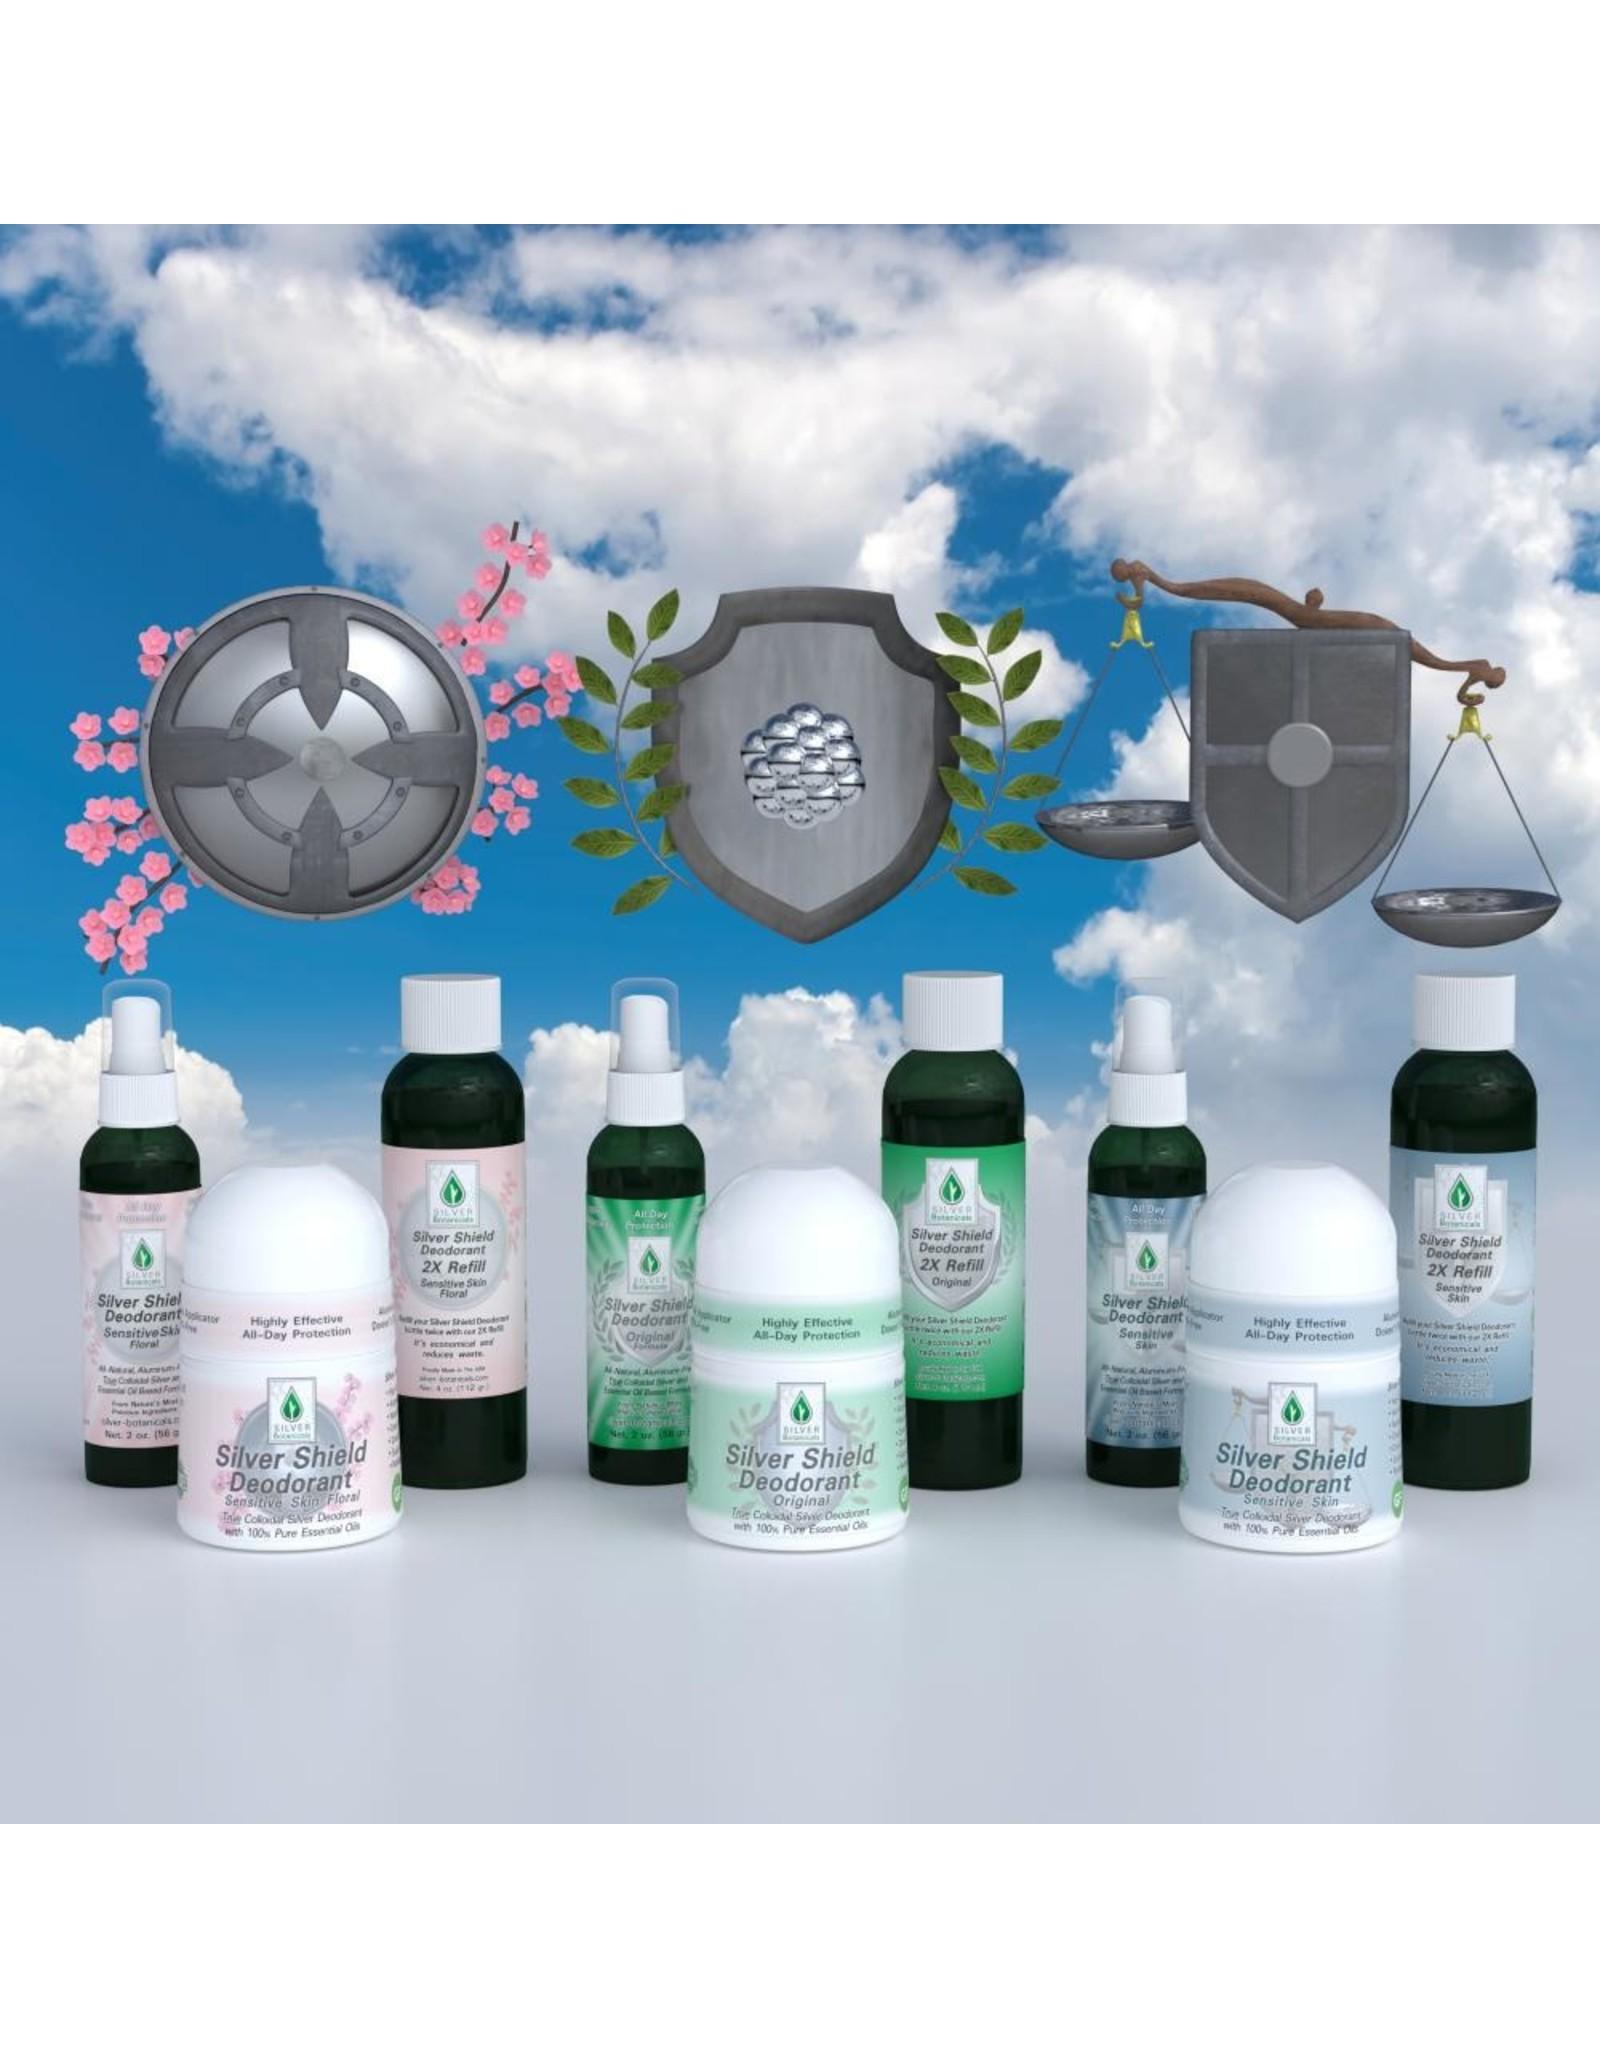 Silver Botanicals Silver Shield Deodorant, Original, Spray On 2oz